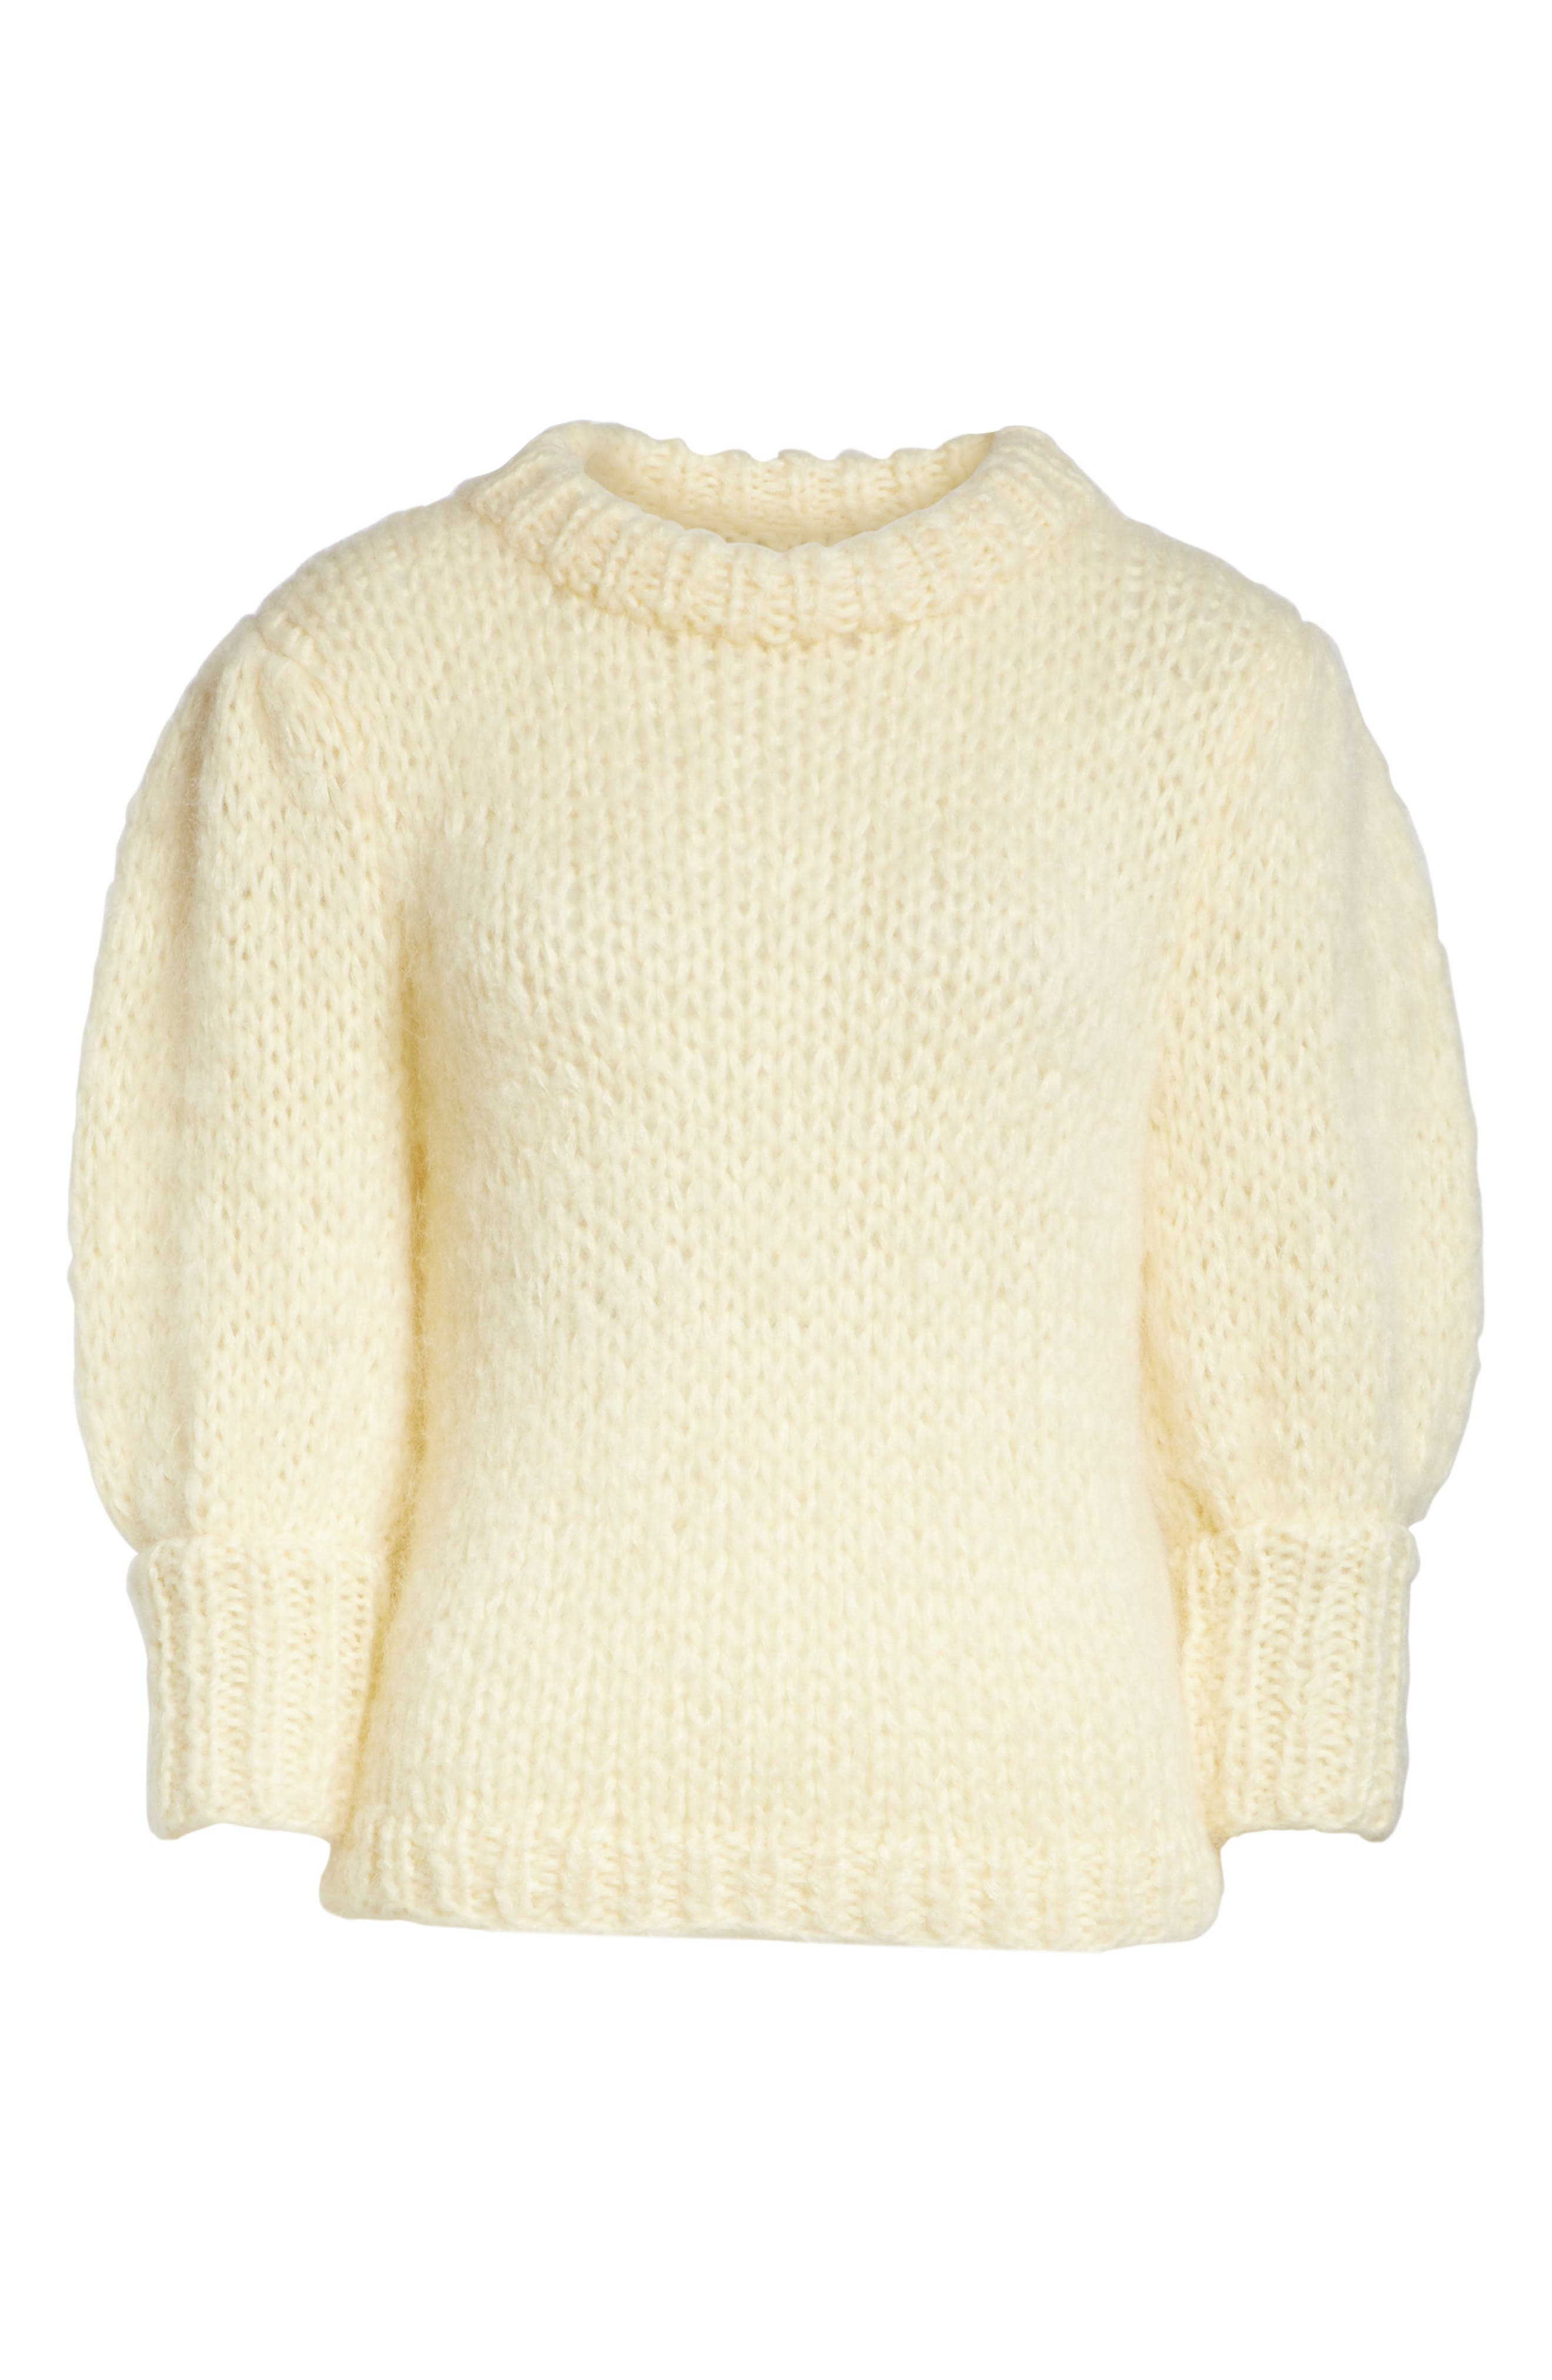 Juilliard Mohair & Wool Puff Sleeve Sweater,                             Alternate thumbnail 6, color,                             900